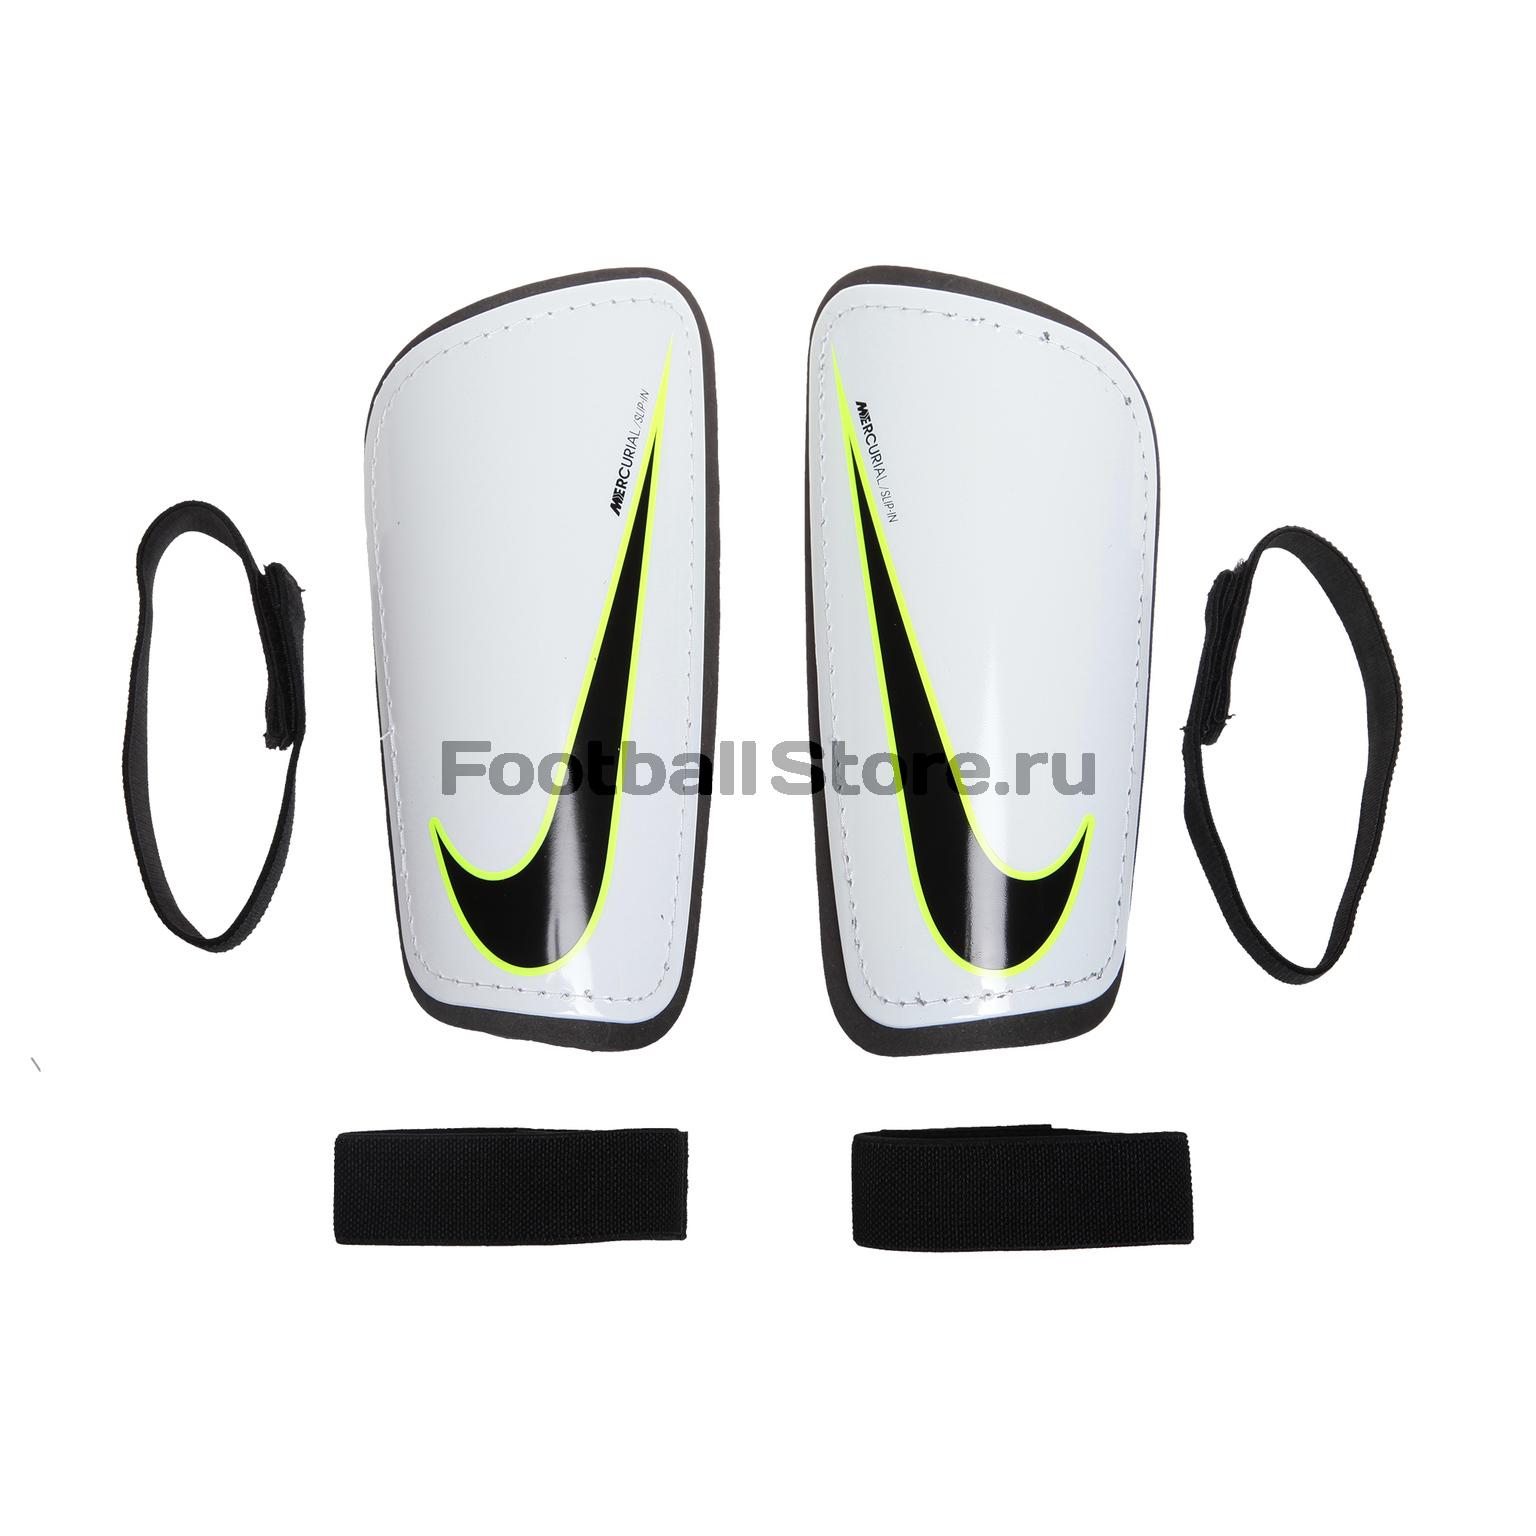 Защита ног Nike Щитки Nike NK Mercurial HRDSHL GRD SP2101-100 щитки футбольные nike nk hrd shell slp grd fa16 sp2101 011 xs чёрный